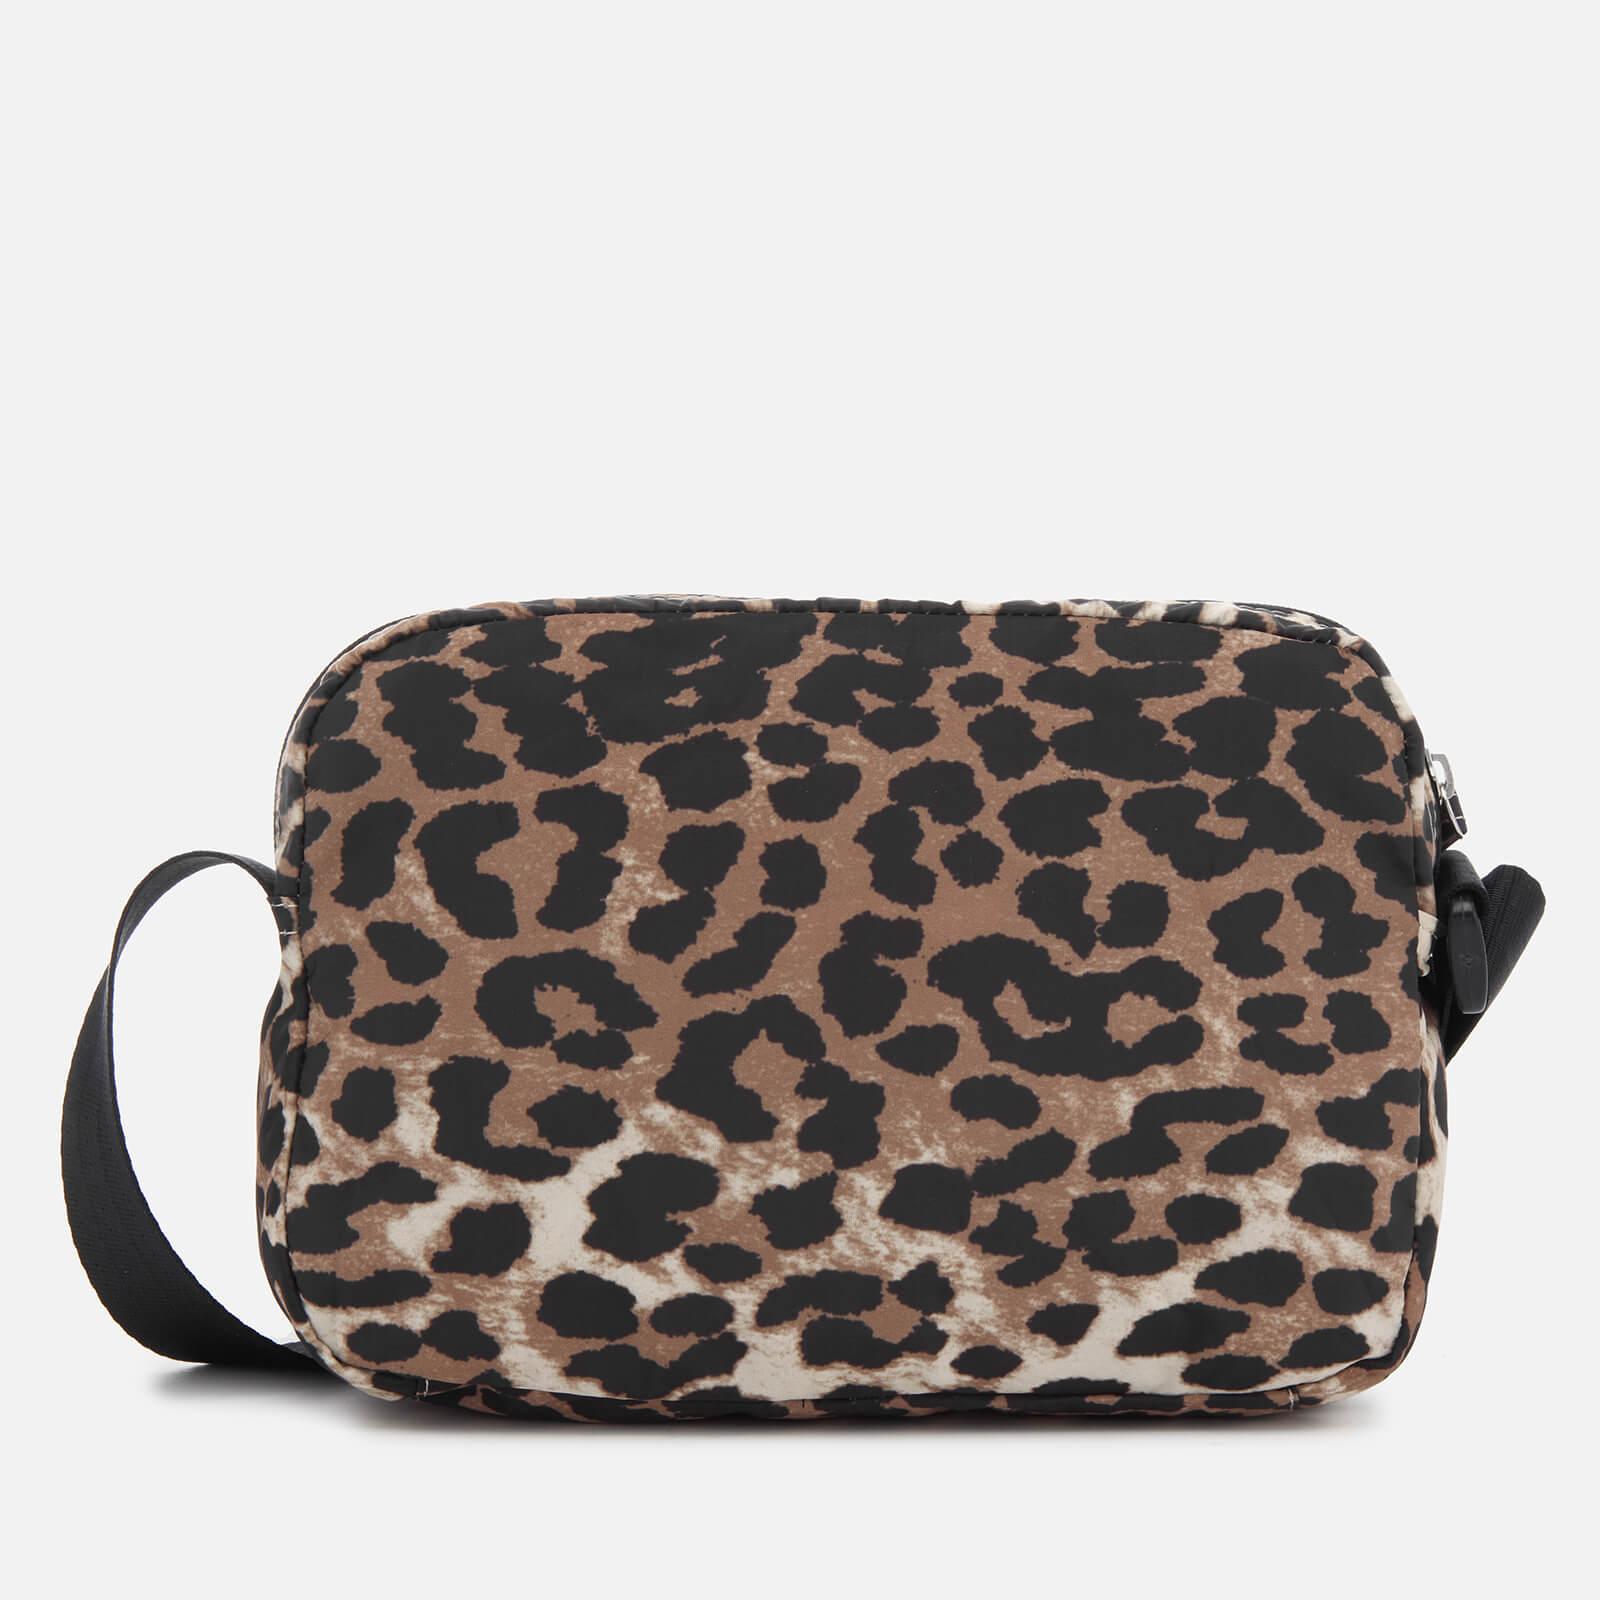 0ba301c5abb4 Ganni Women's Fairmont Cross Body Bag - Leopard - Free UK Delivery over £50